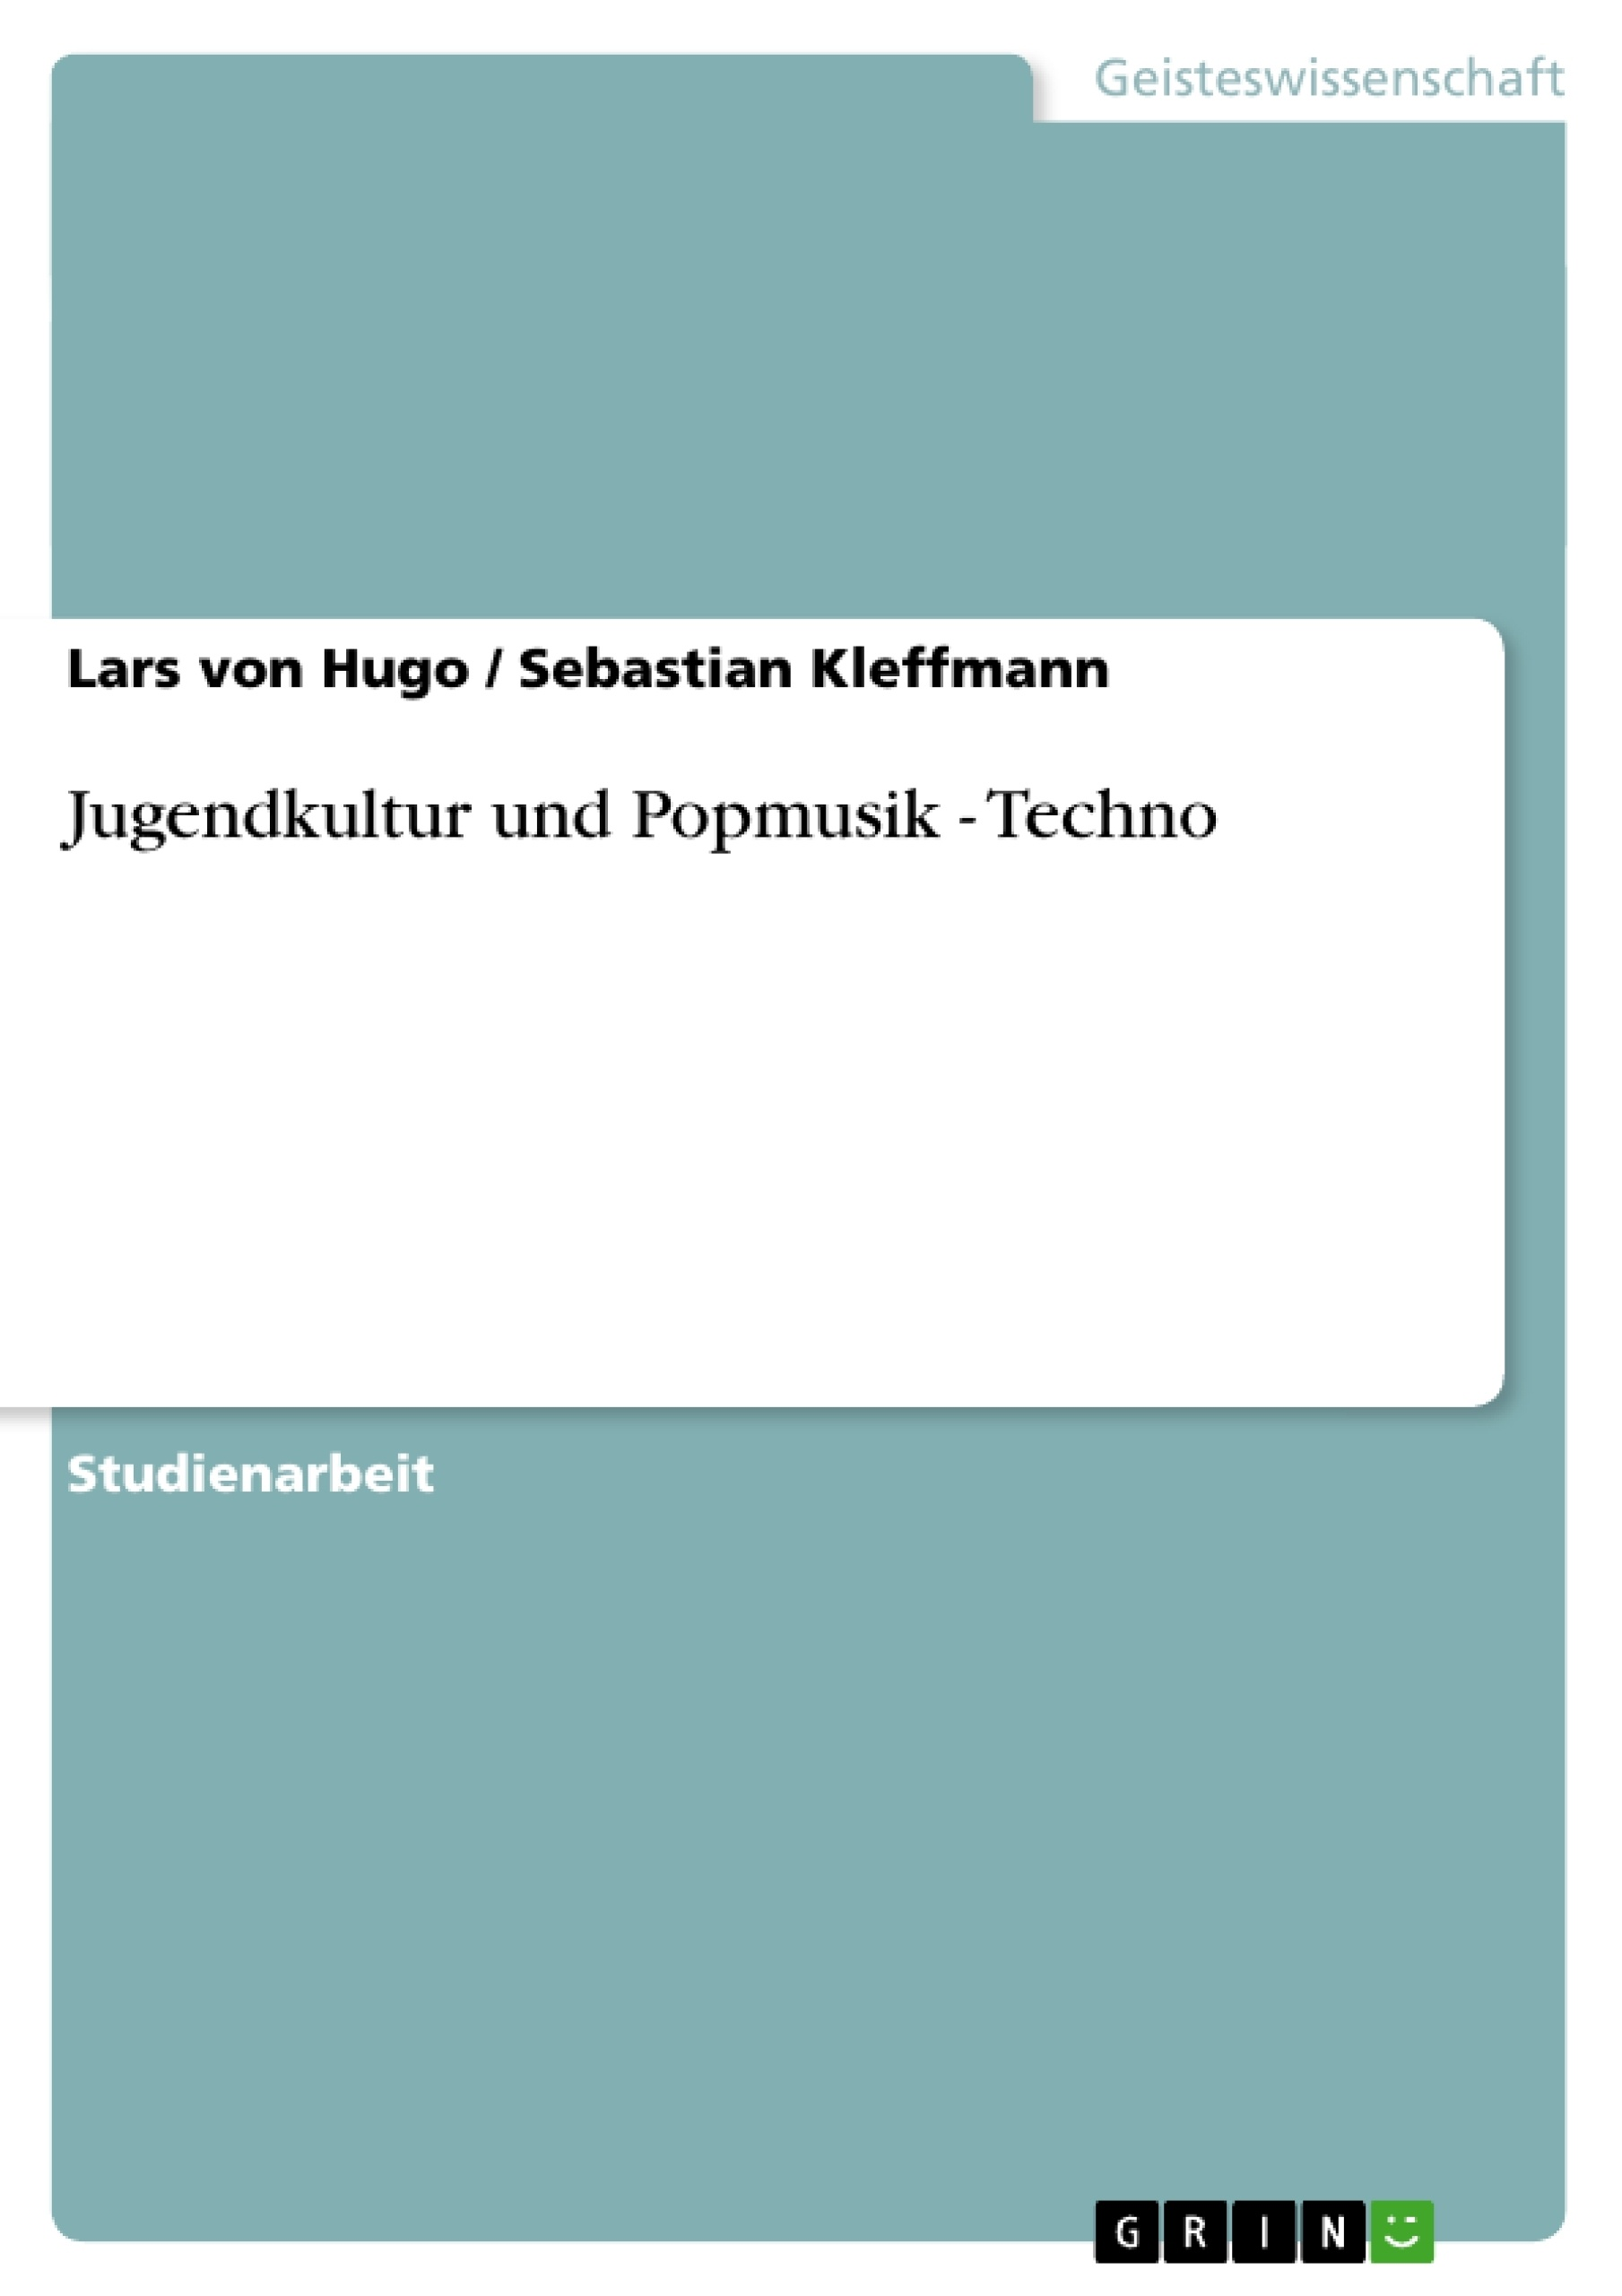 Titel: Jugendkultur und Popmusik - Techno